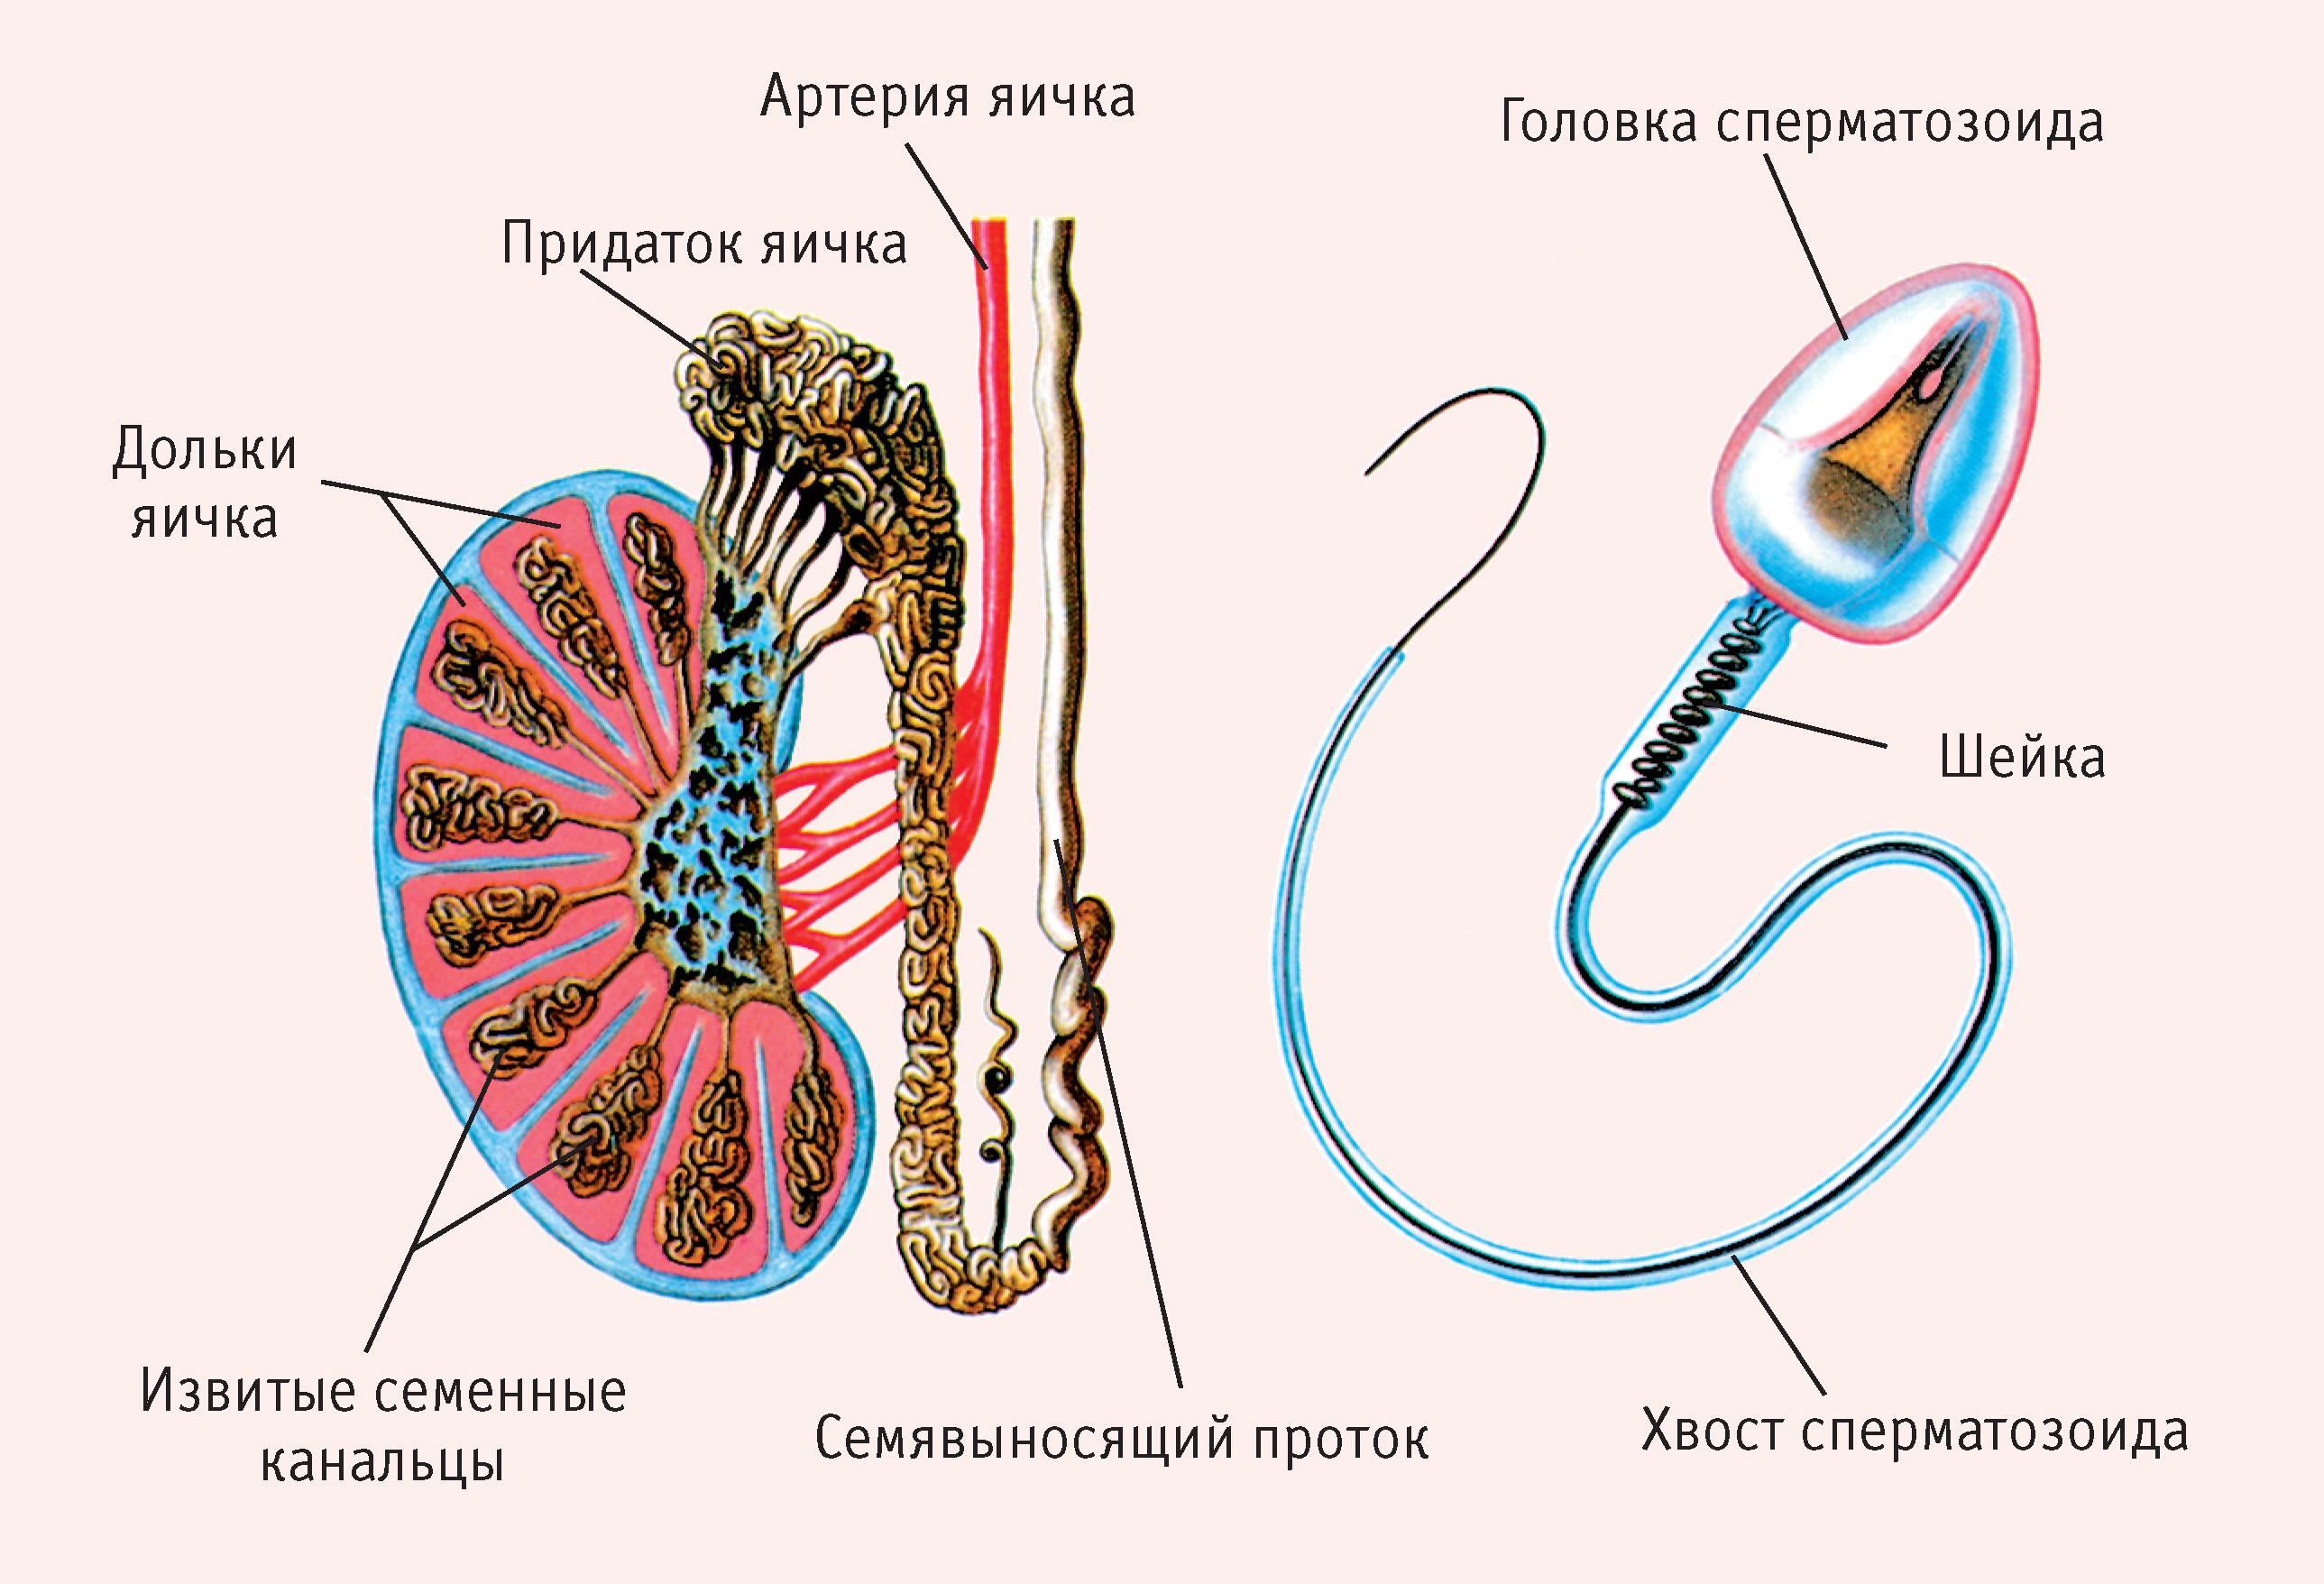 Сперматозоид фото